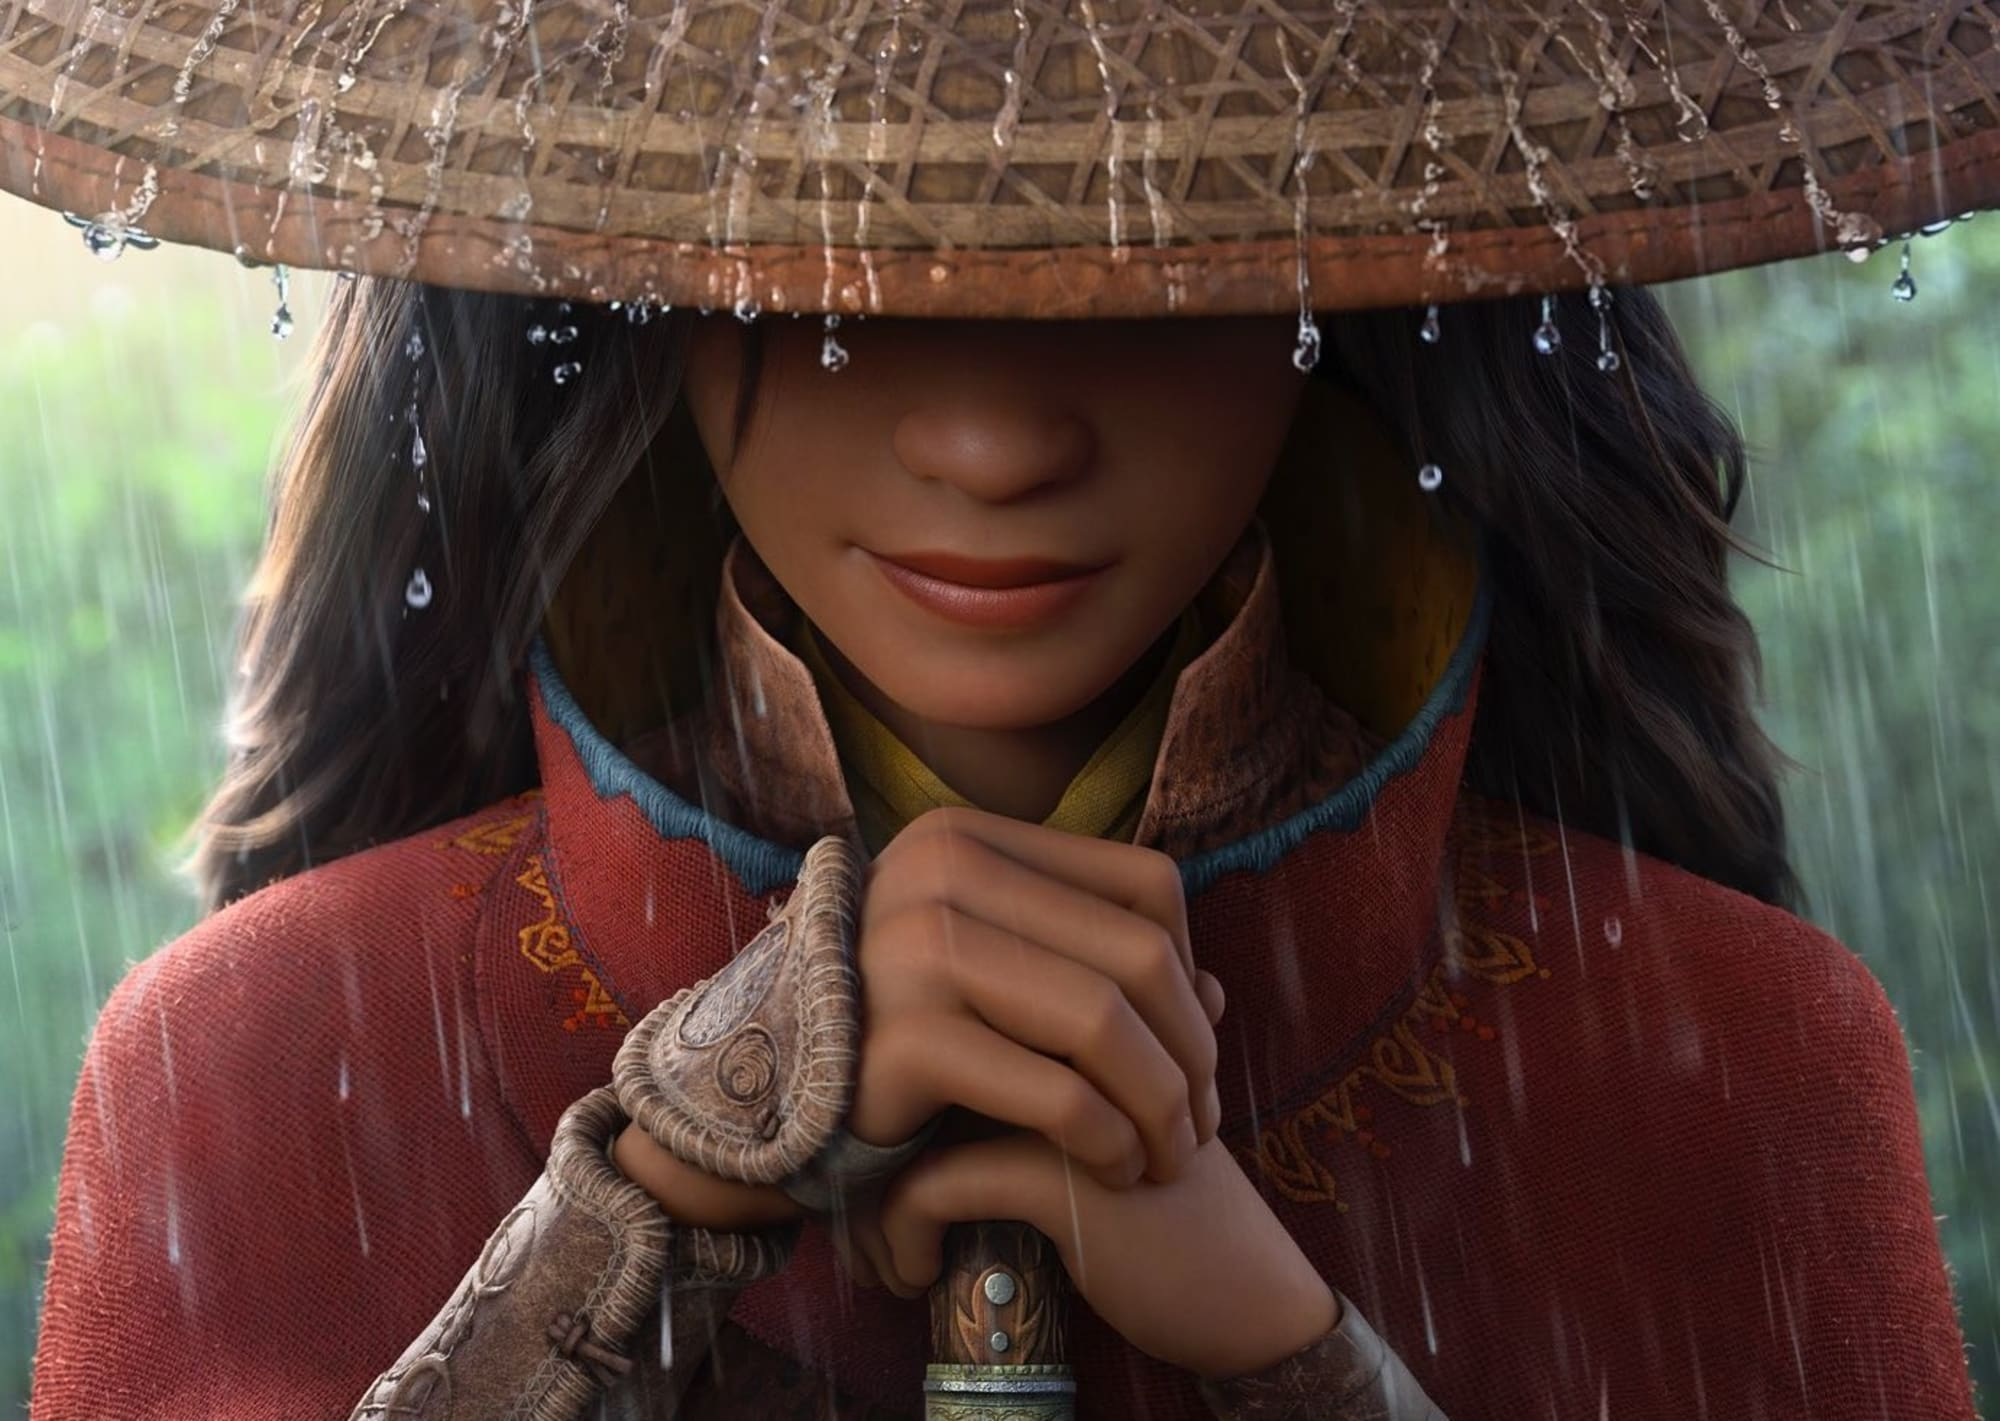 Trailer: Star Wars' Kelly Marie Tran stars in Disney's Raya and the Last Dragon